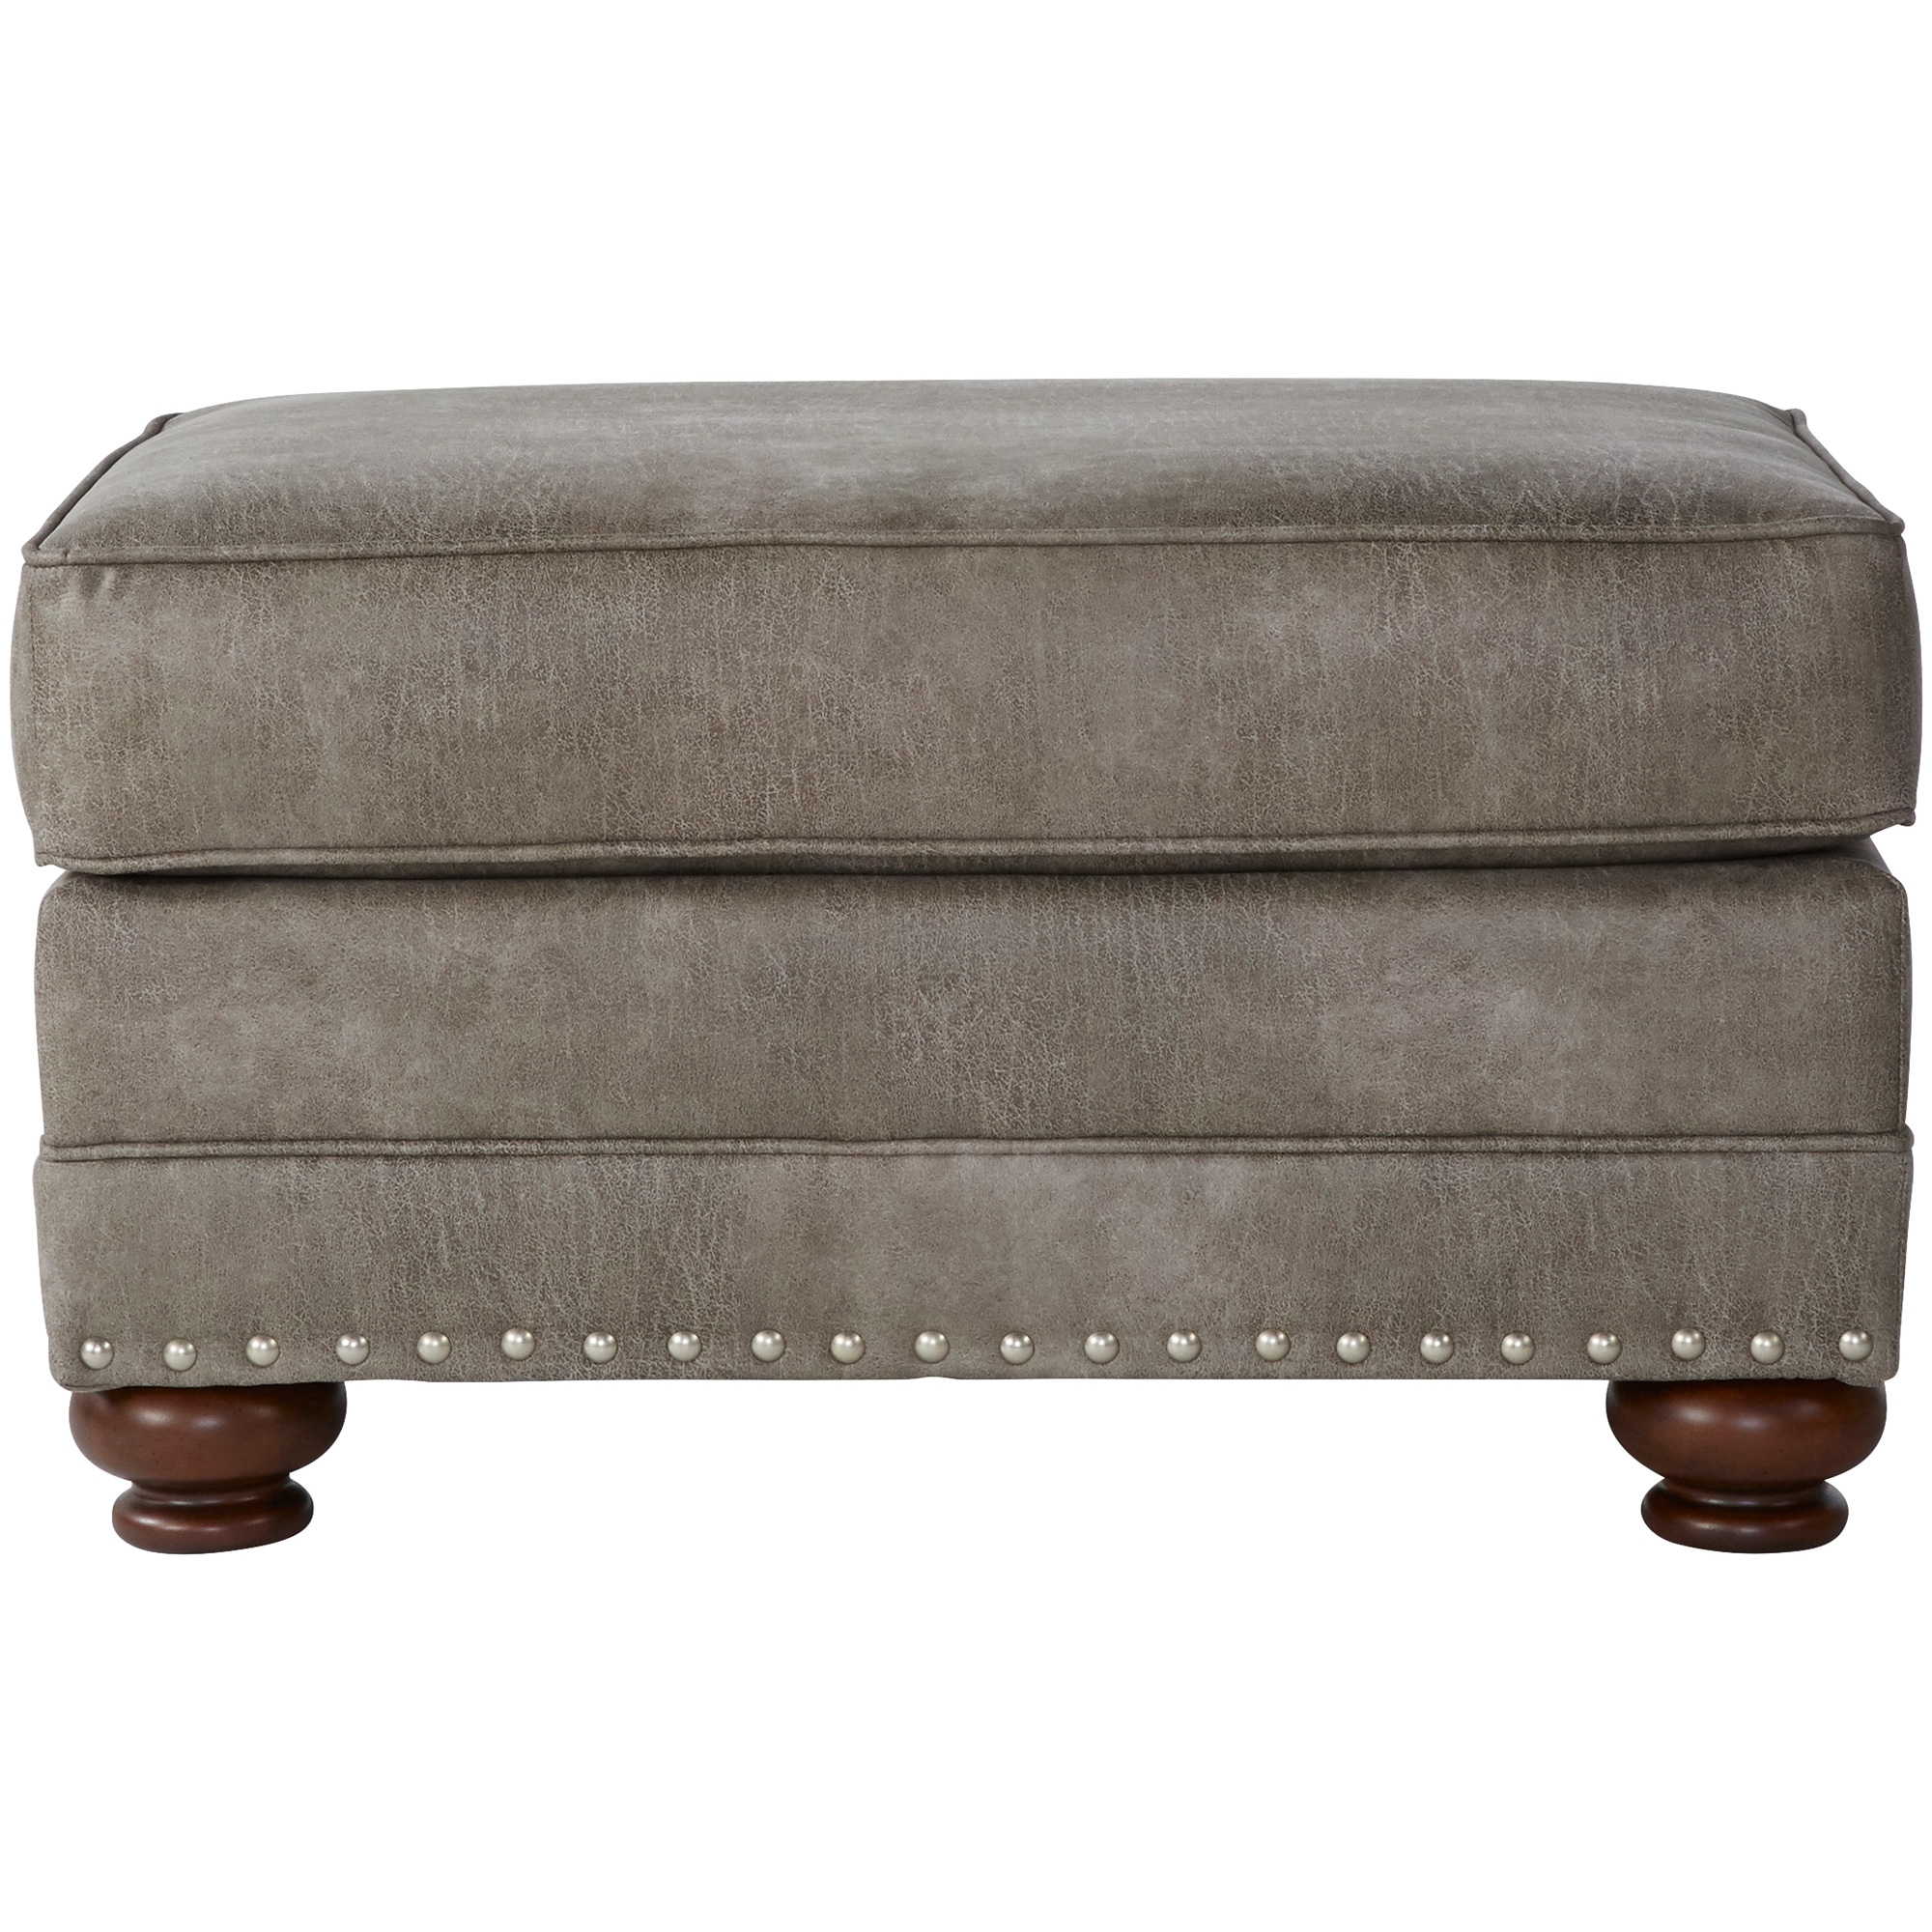 Serta Upholstery By Hughes Furniture | Bester Golitha Mica Ottoman